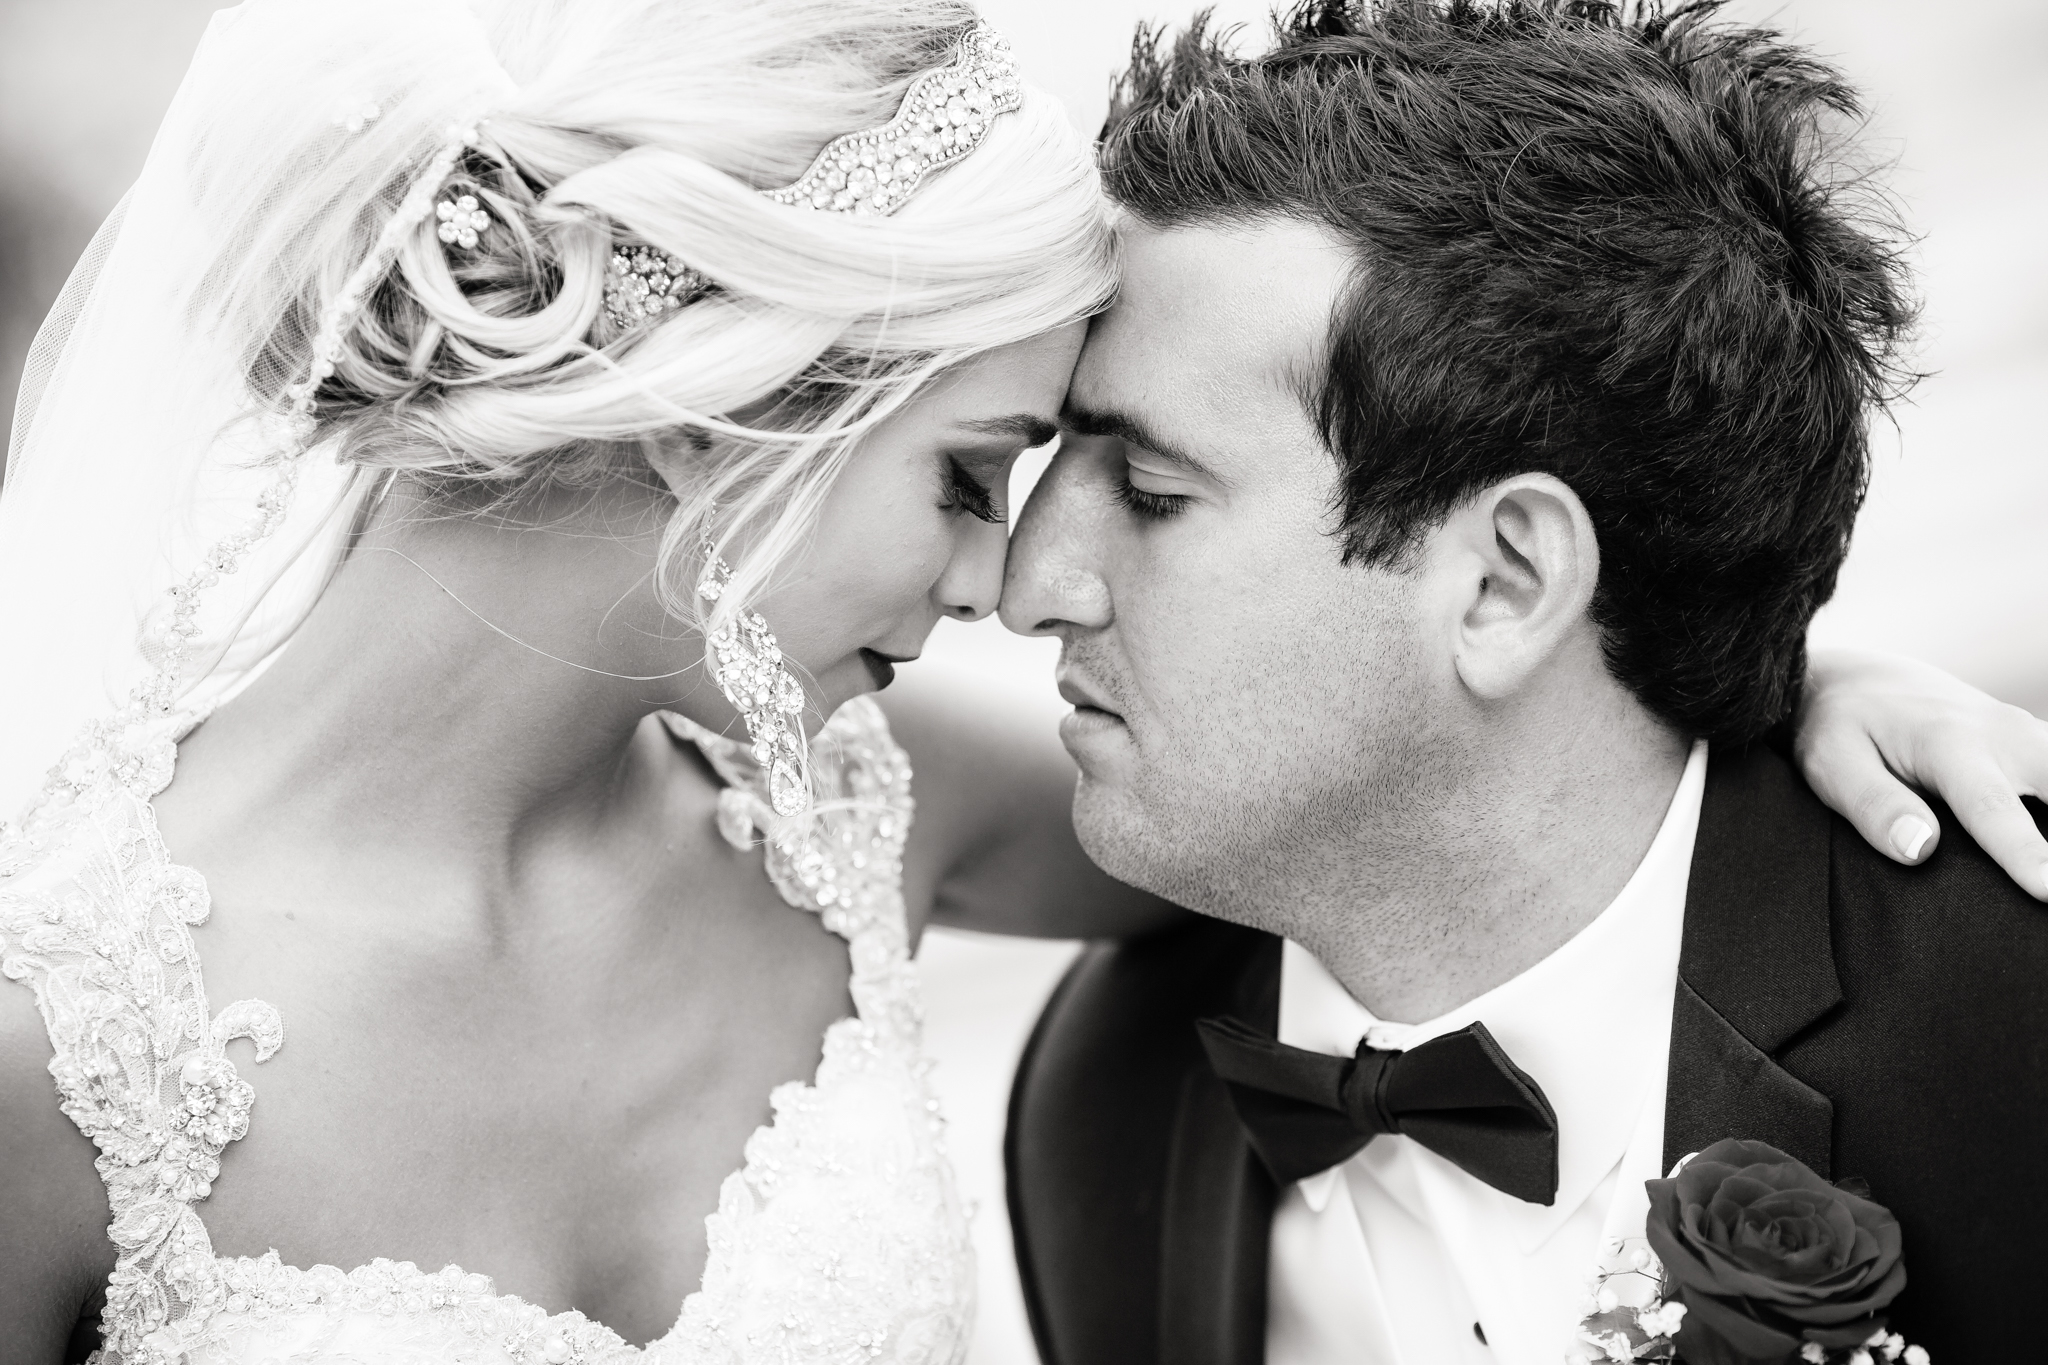 Statler-City-Buffalo-wedding-photographer- 0459bw.jpg